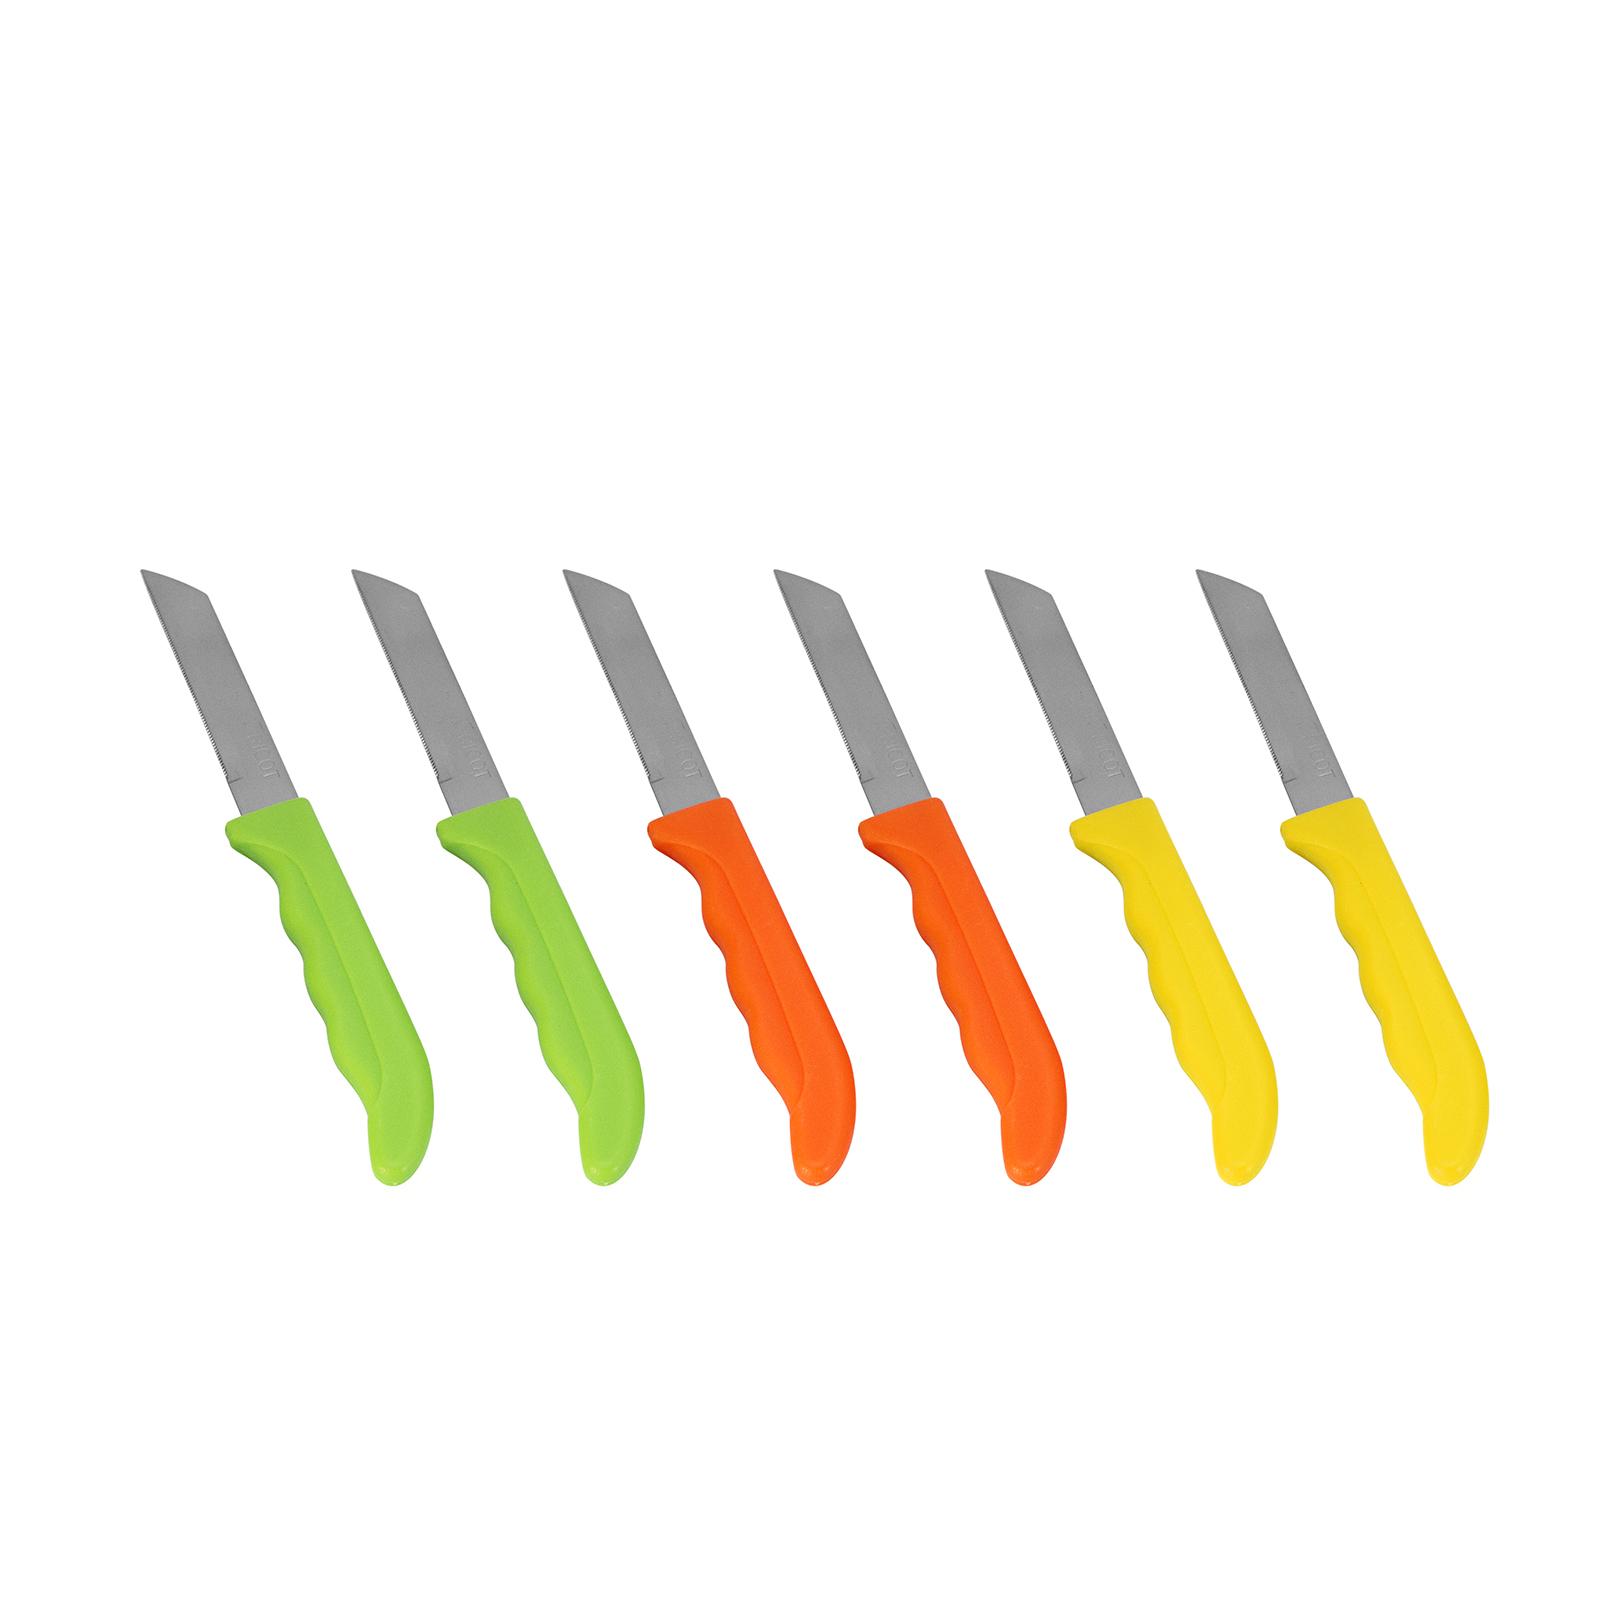 Apricot Norinco 6lı Meyve Bıçak Seti Ht201706